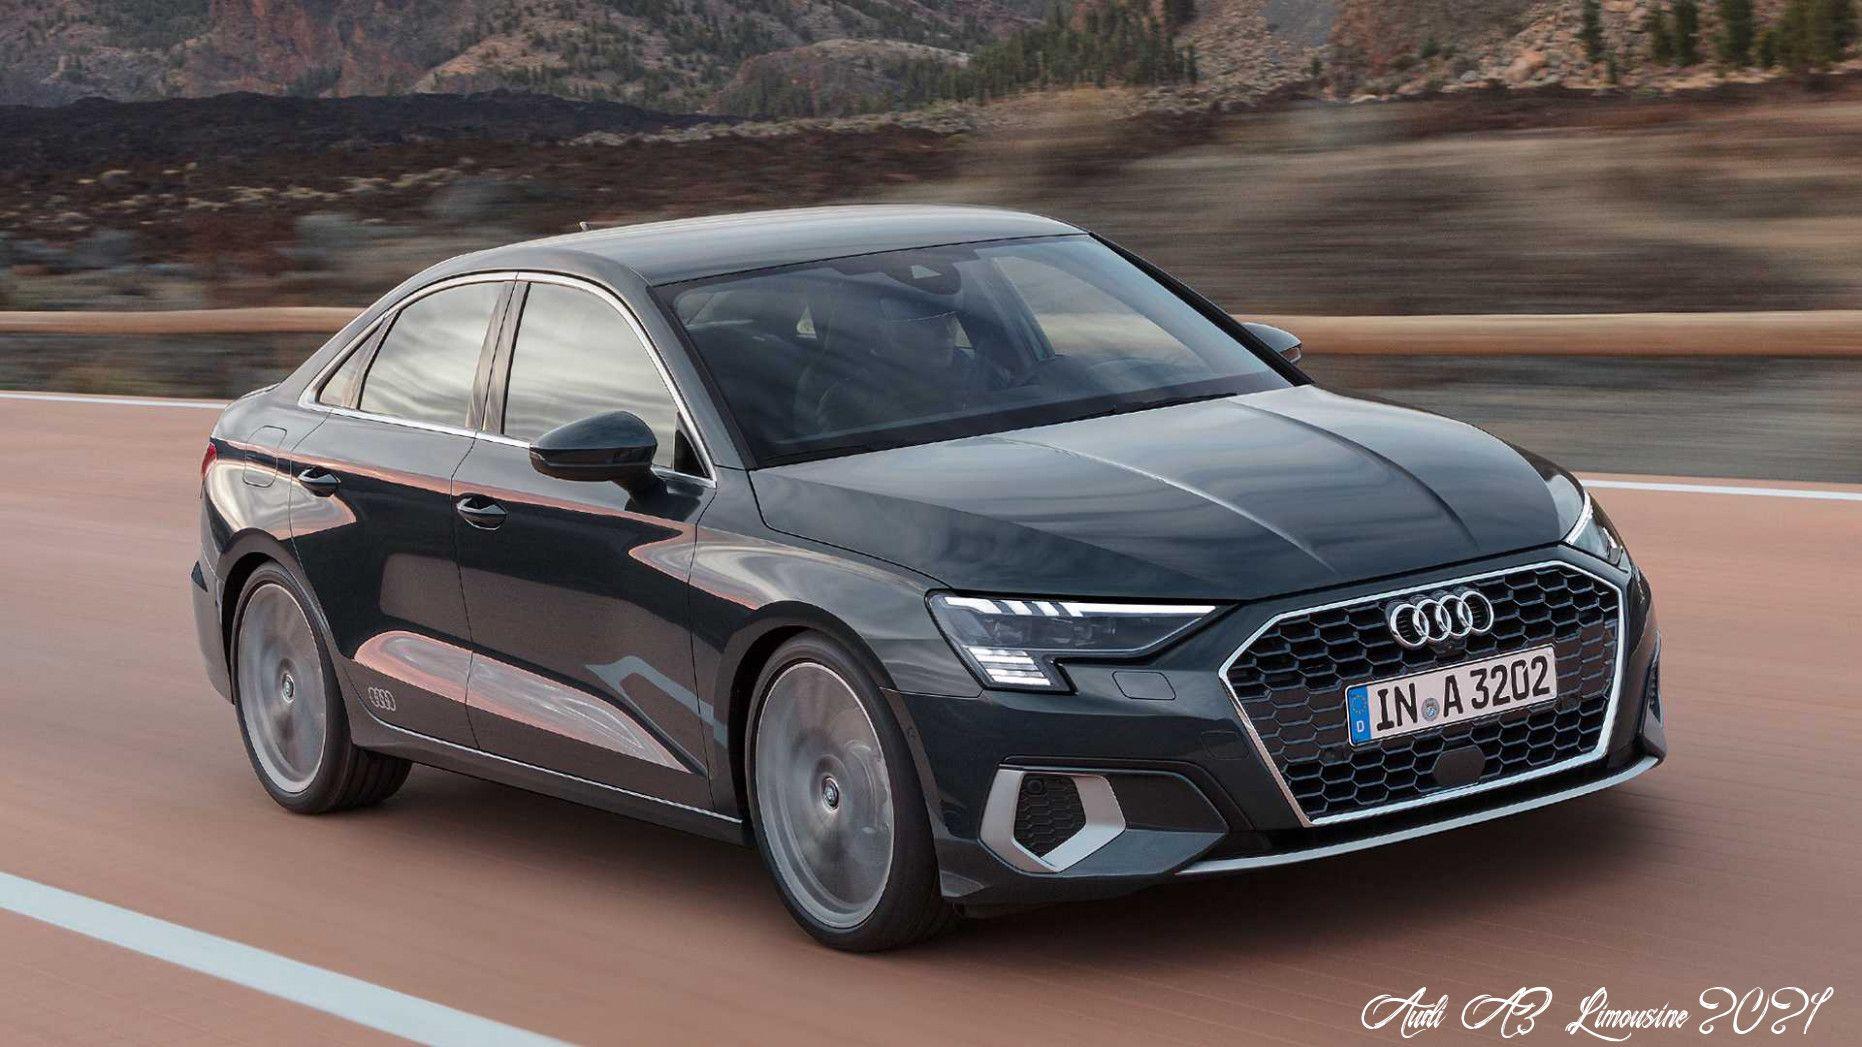 Audi A3 Limousine 2021 Rumors In 2020 Audi A3 Sedan Audi A3 Audi